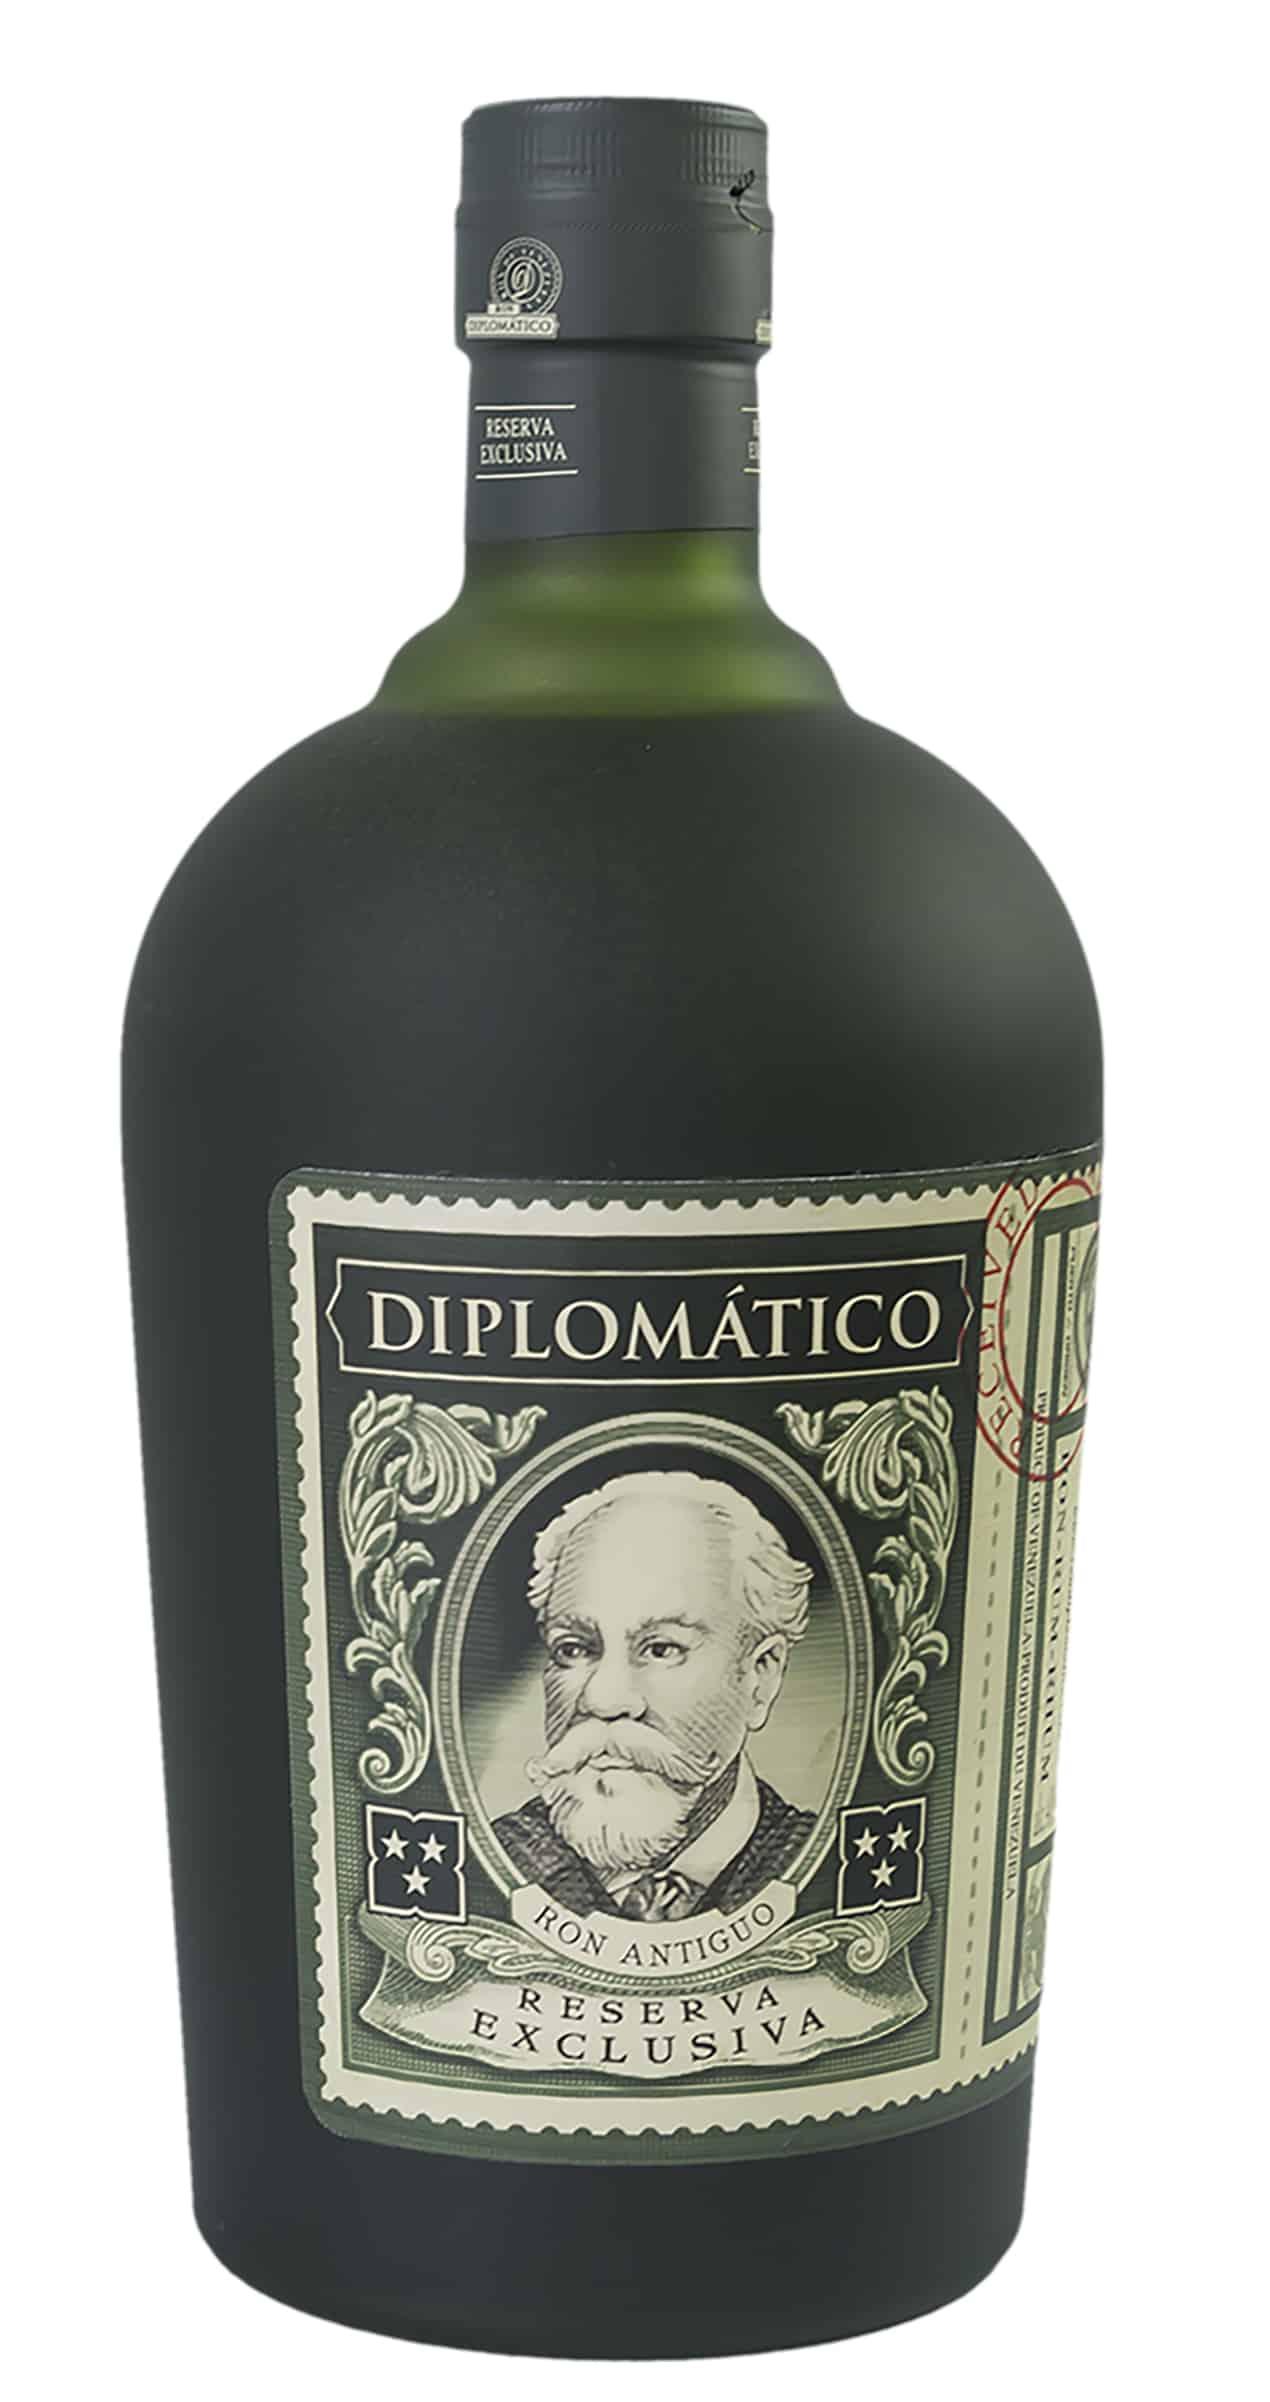 Diplomático Res. Exclusiva Double Magnum